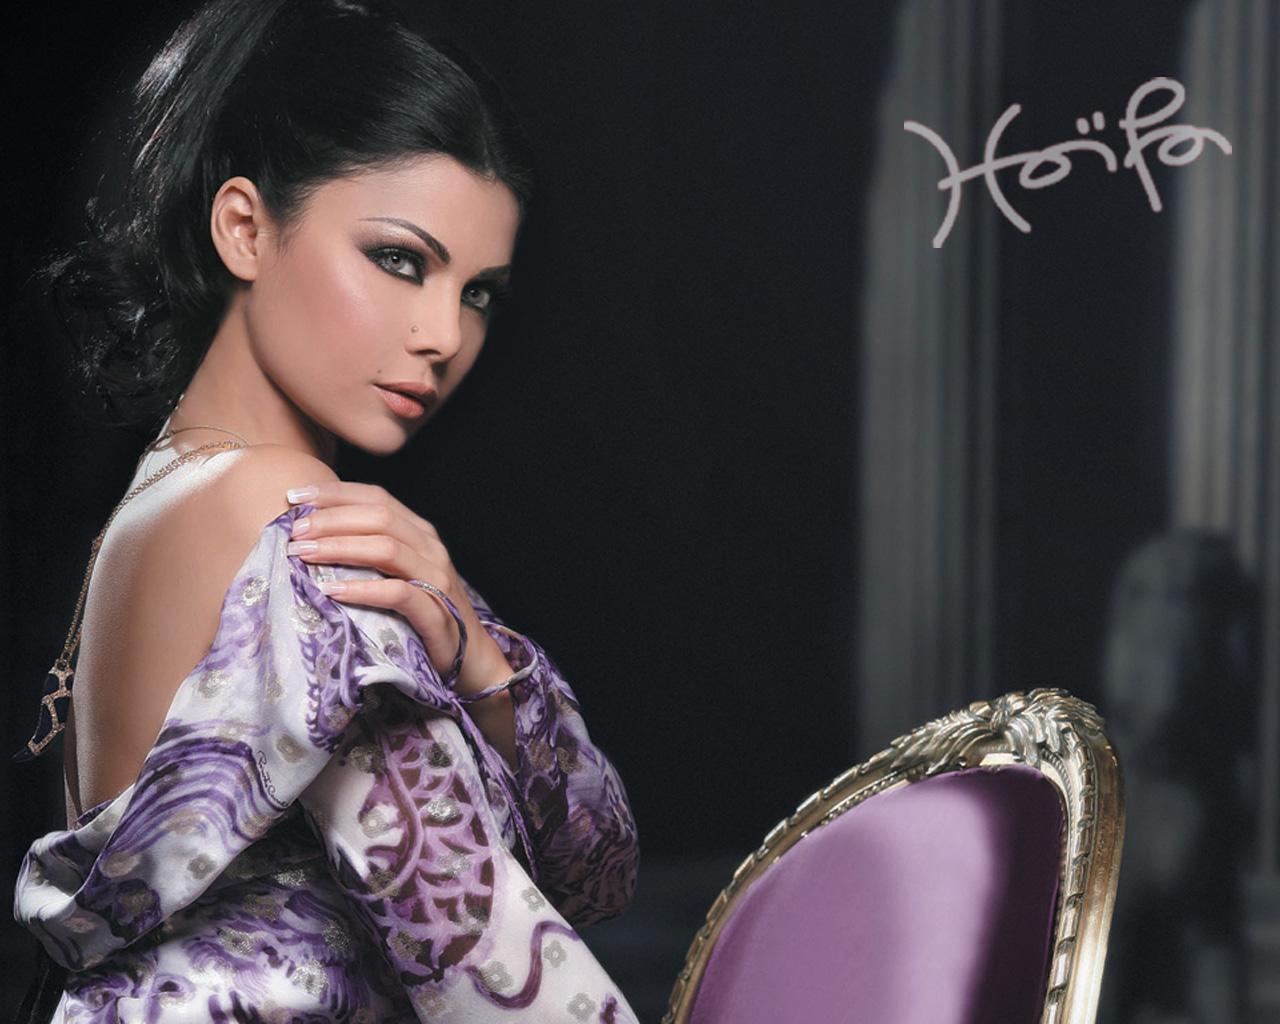 http://2.bp.blogspot.com/-hE3q87564LU/UFMYuRJlozI/AAAAAAAABVQ/FXY1GPX705M/s1600/Haifa+Wehbe+003.jpg